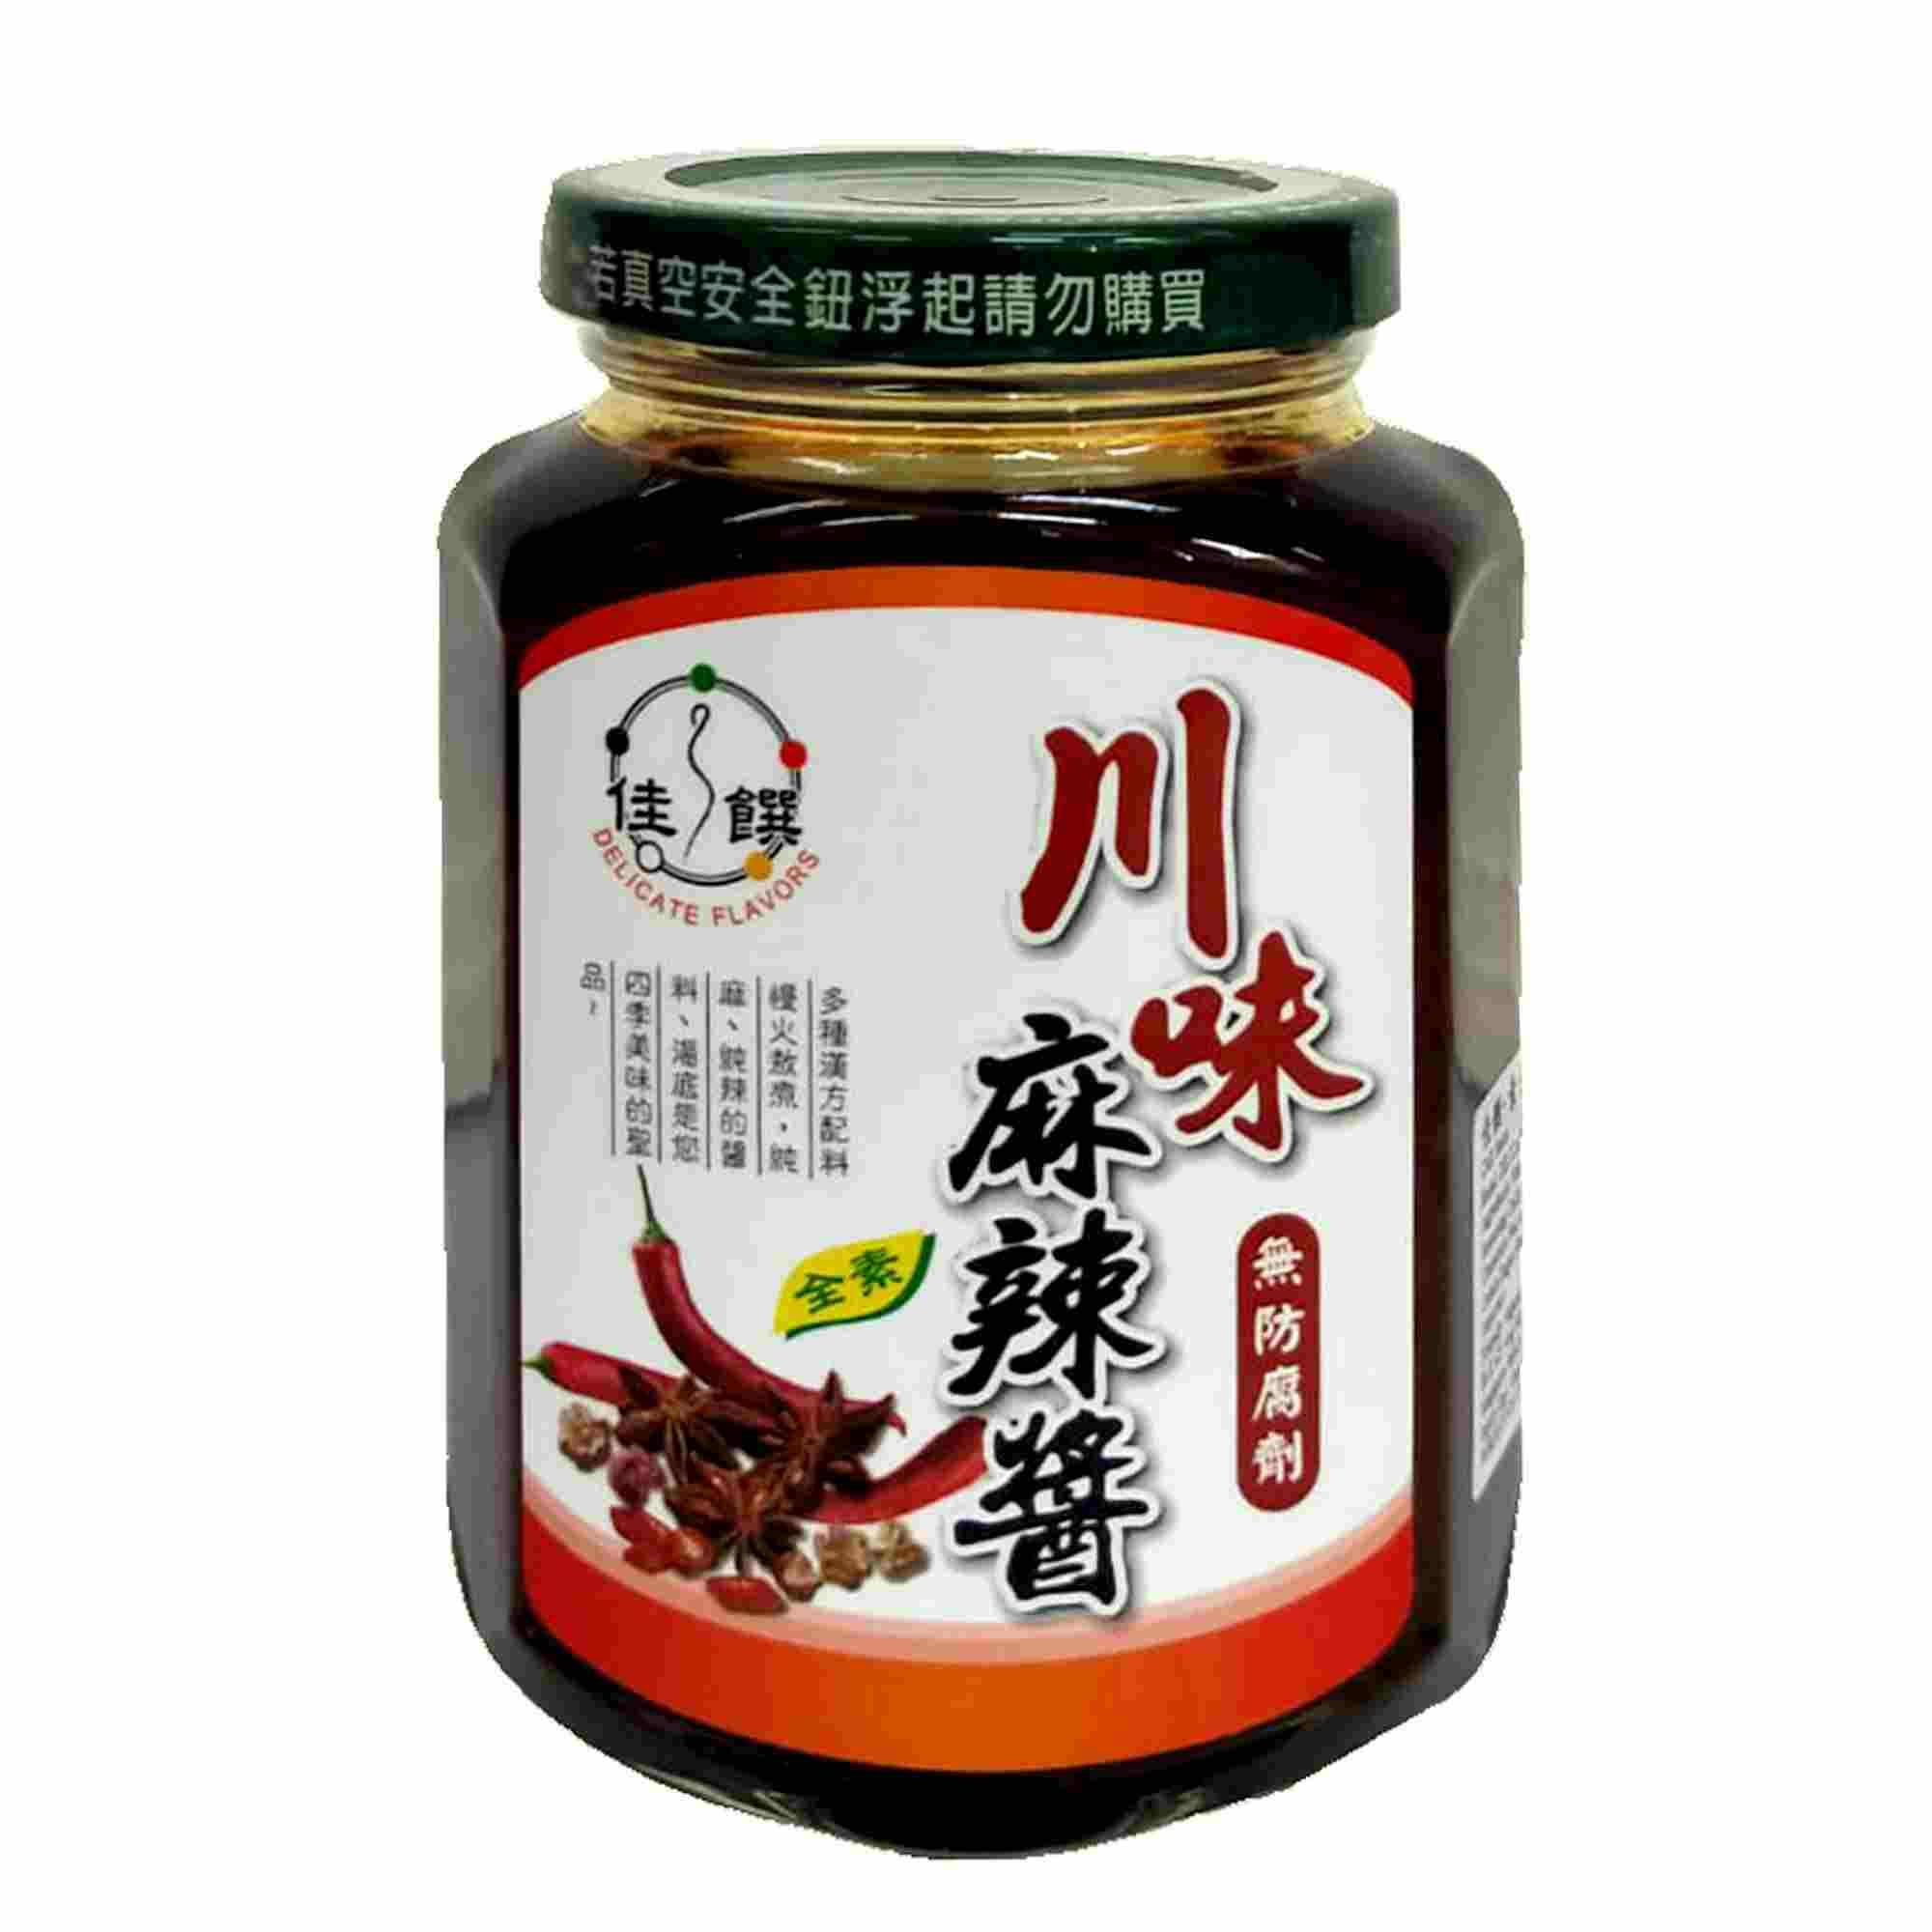 Image MALA Chilli Paste 佳馔-川味麻辣酱 370grams